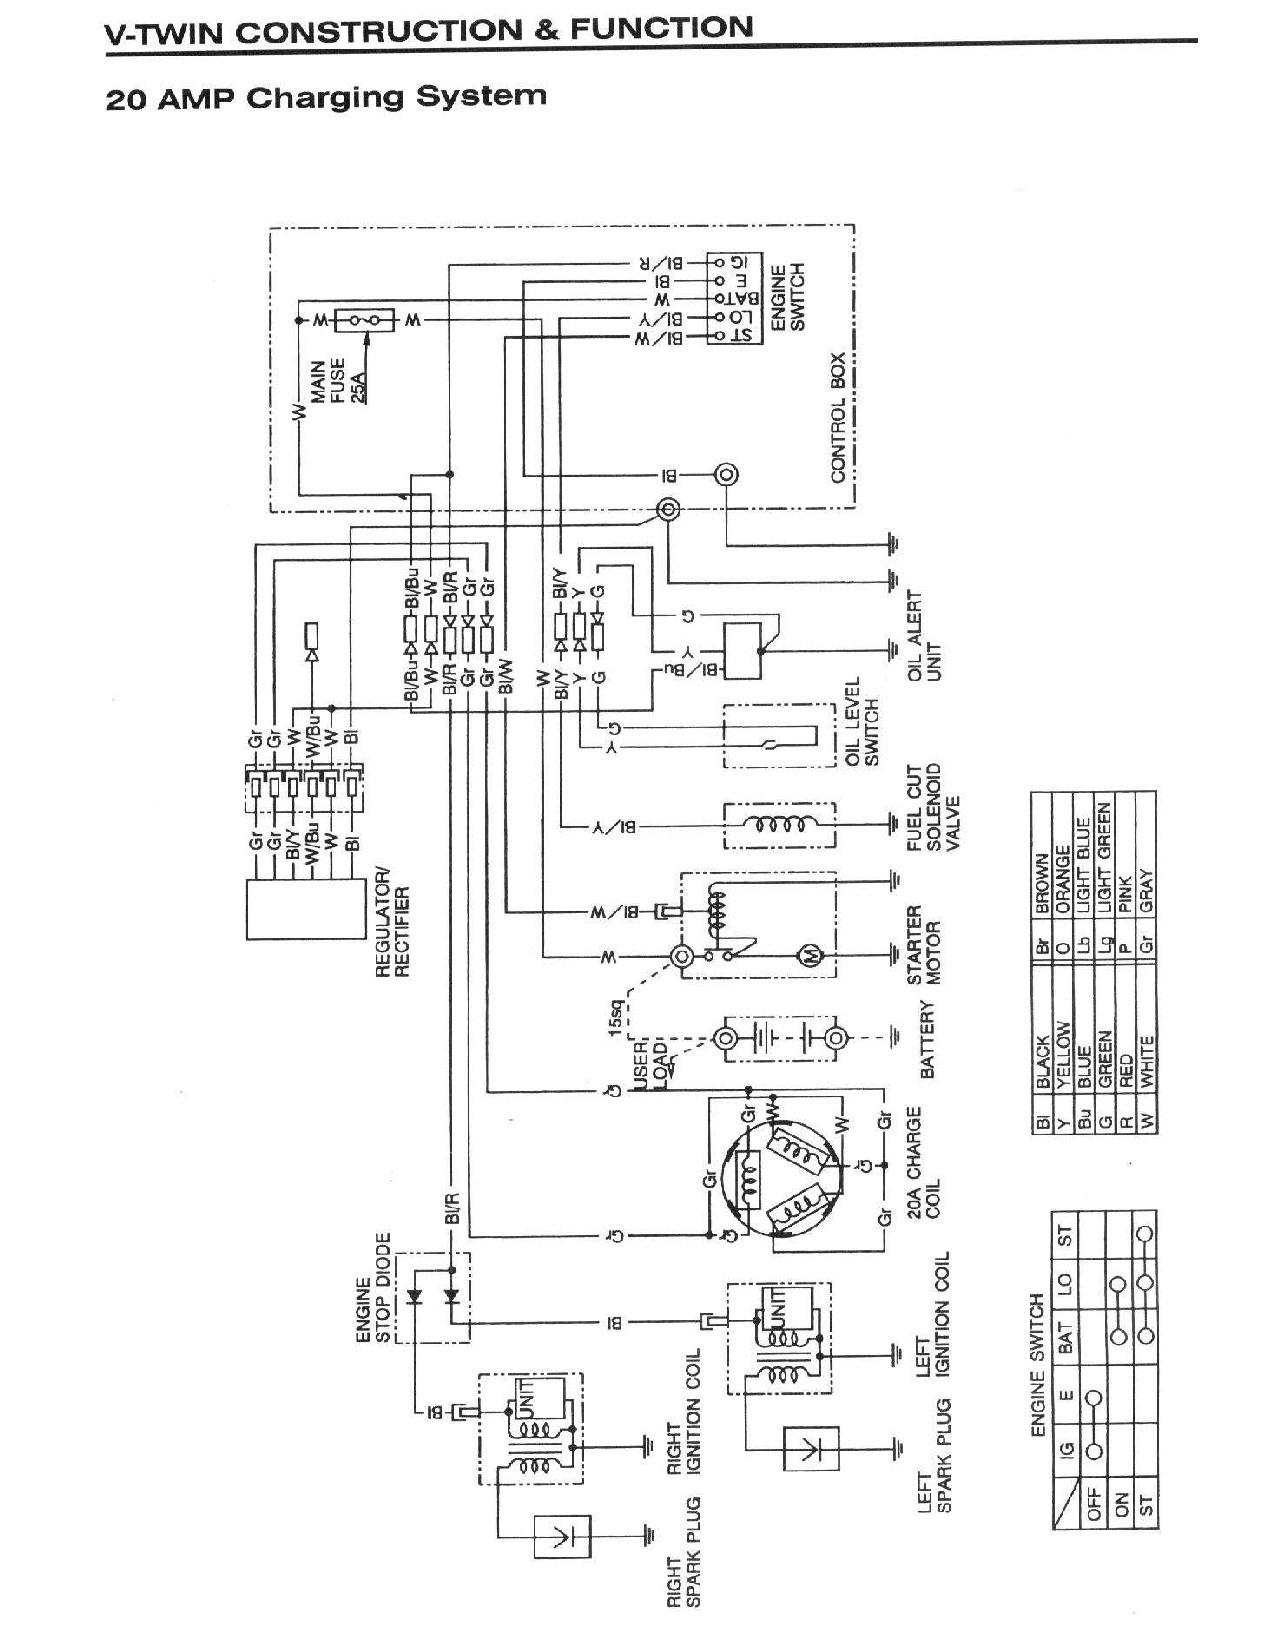 Honda Gx620 Electric Wiring | Wiring Diagram - Honda Gx390 Wiring Diagram